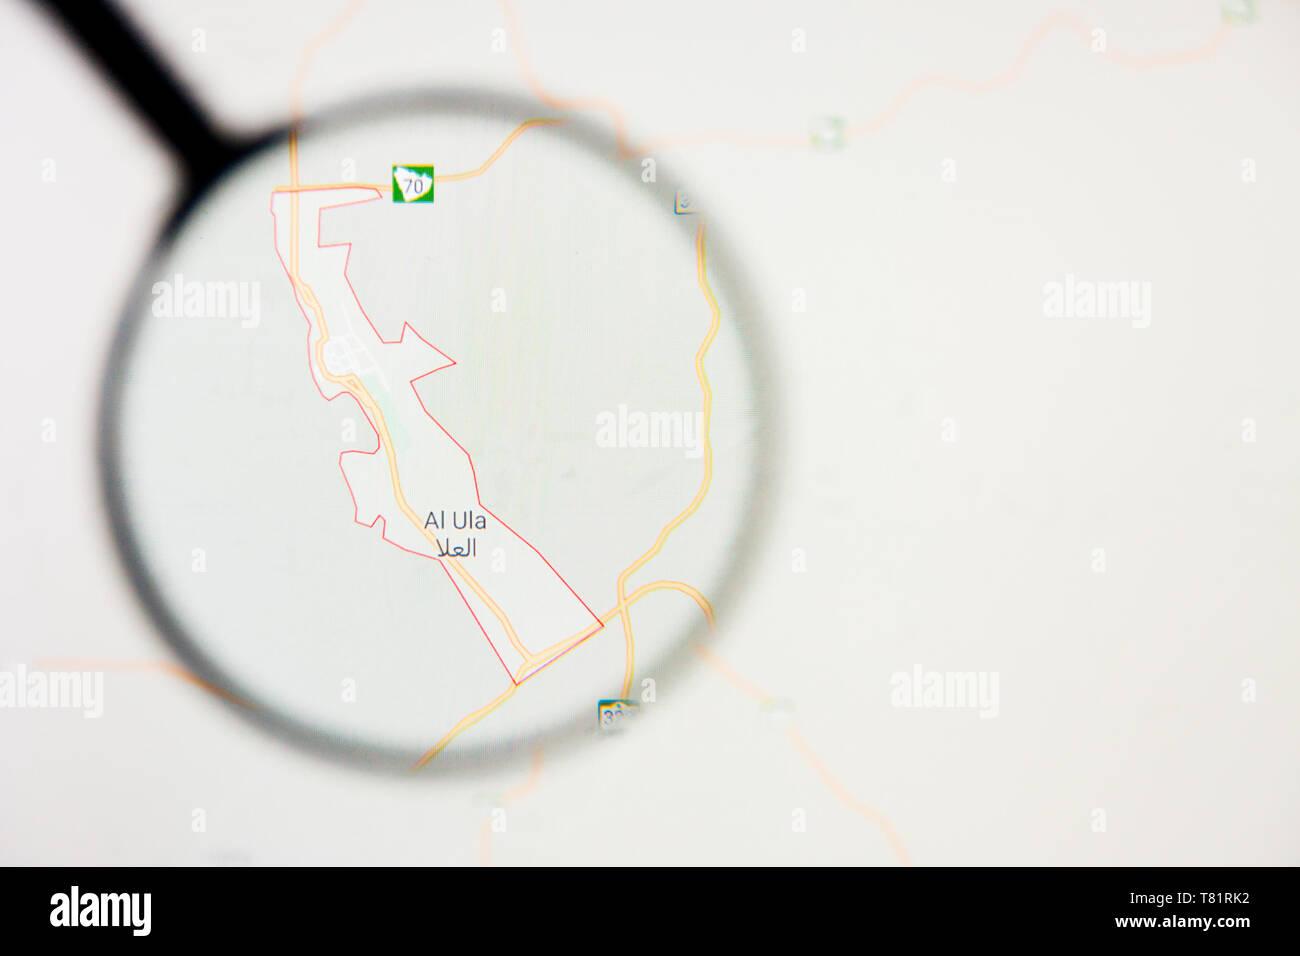 Al-Ula city in Saudi Arabia visualization illustrative concept on screen through magnifying glass - Stock Image